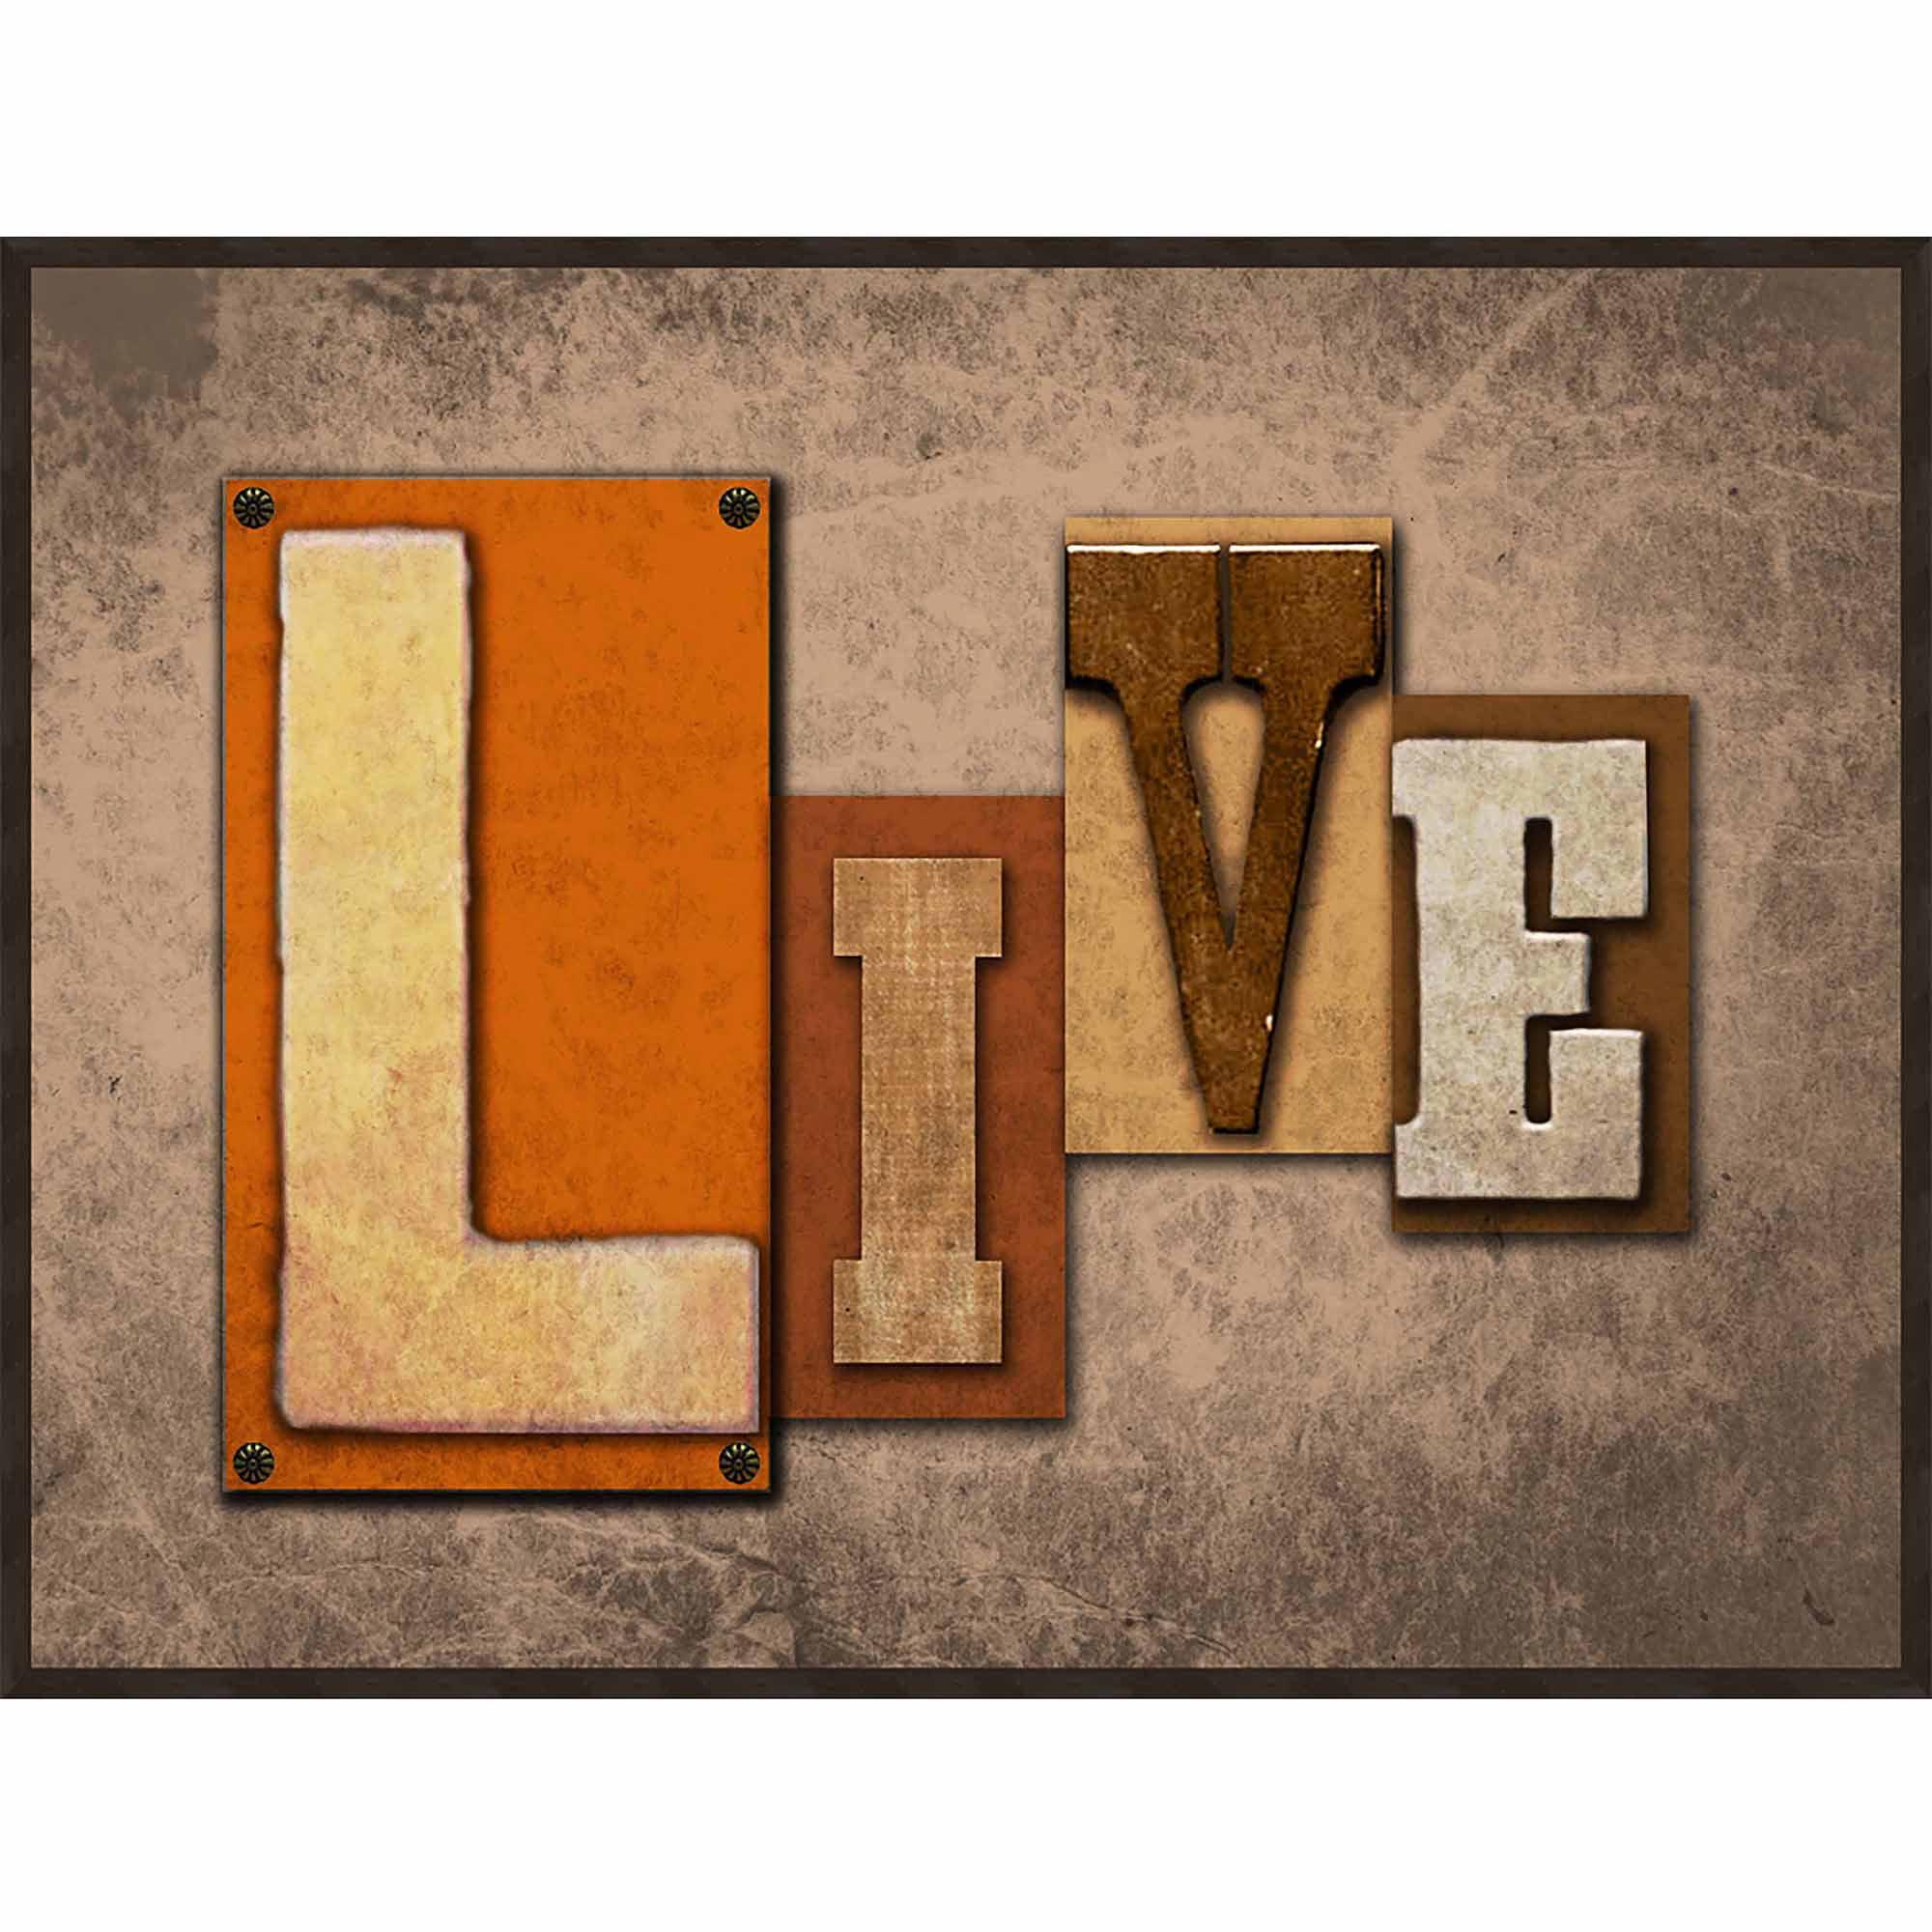 Live Wall Artwork by Pro Tour Memorabilia, LLC